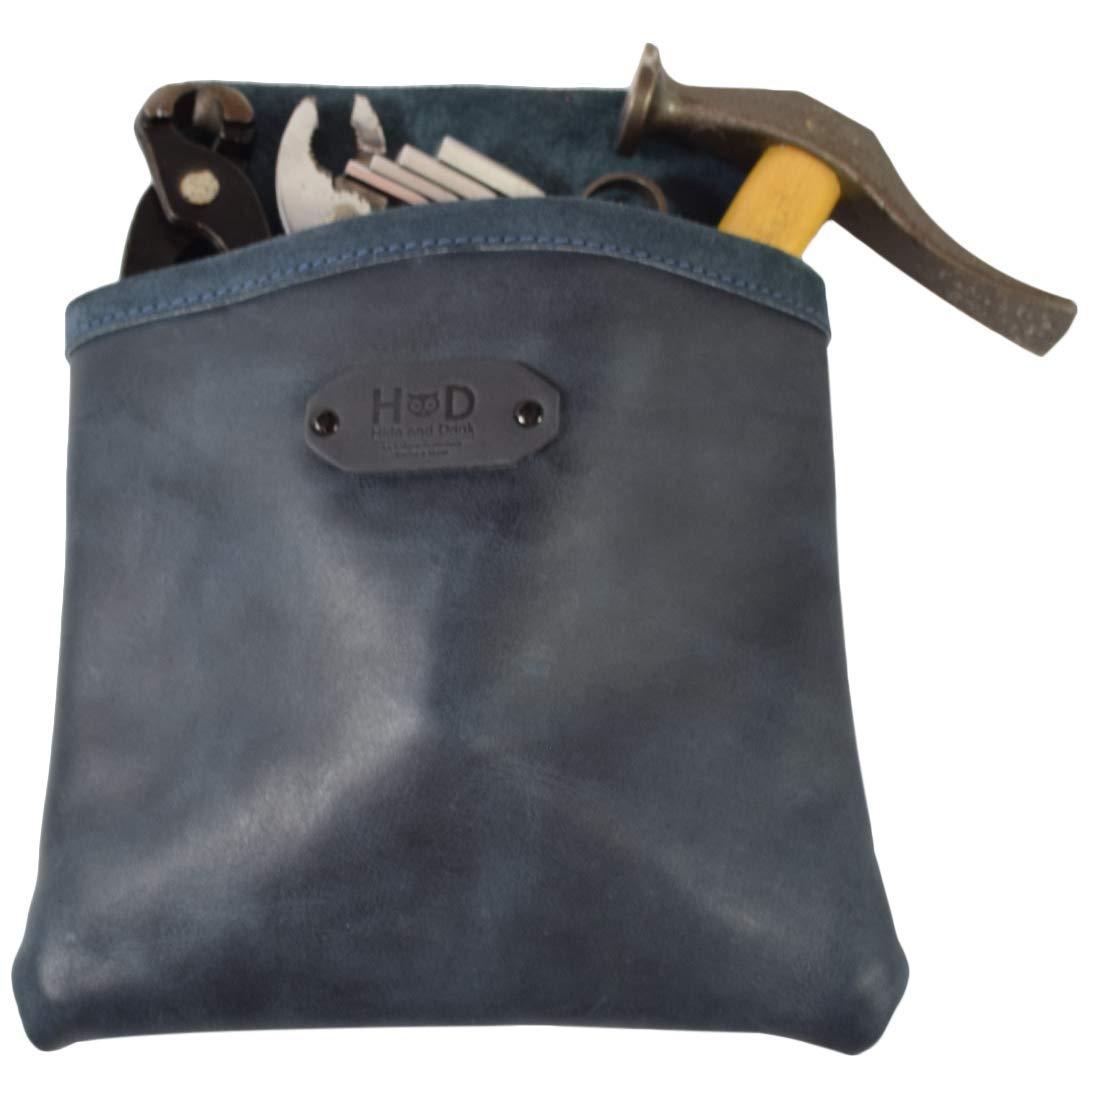 Leather Single Big Pocket Professional Nail/Tool Belt Bag for Constructor/Electrician / Plumber Handmade by Hide & Drink :: Slate Blue